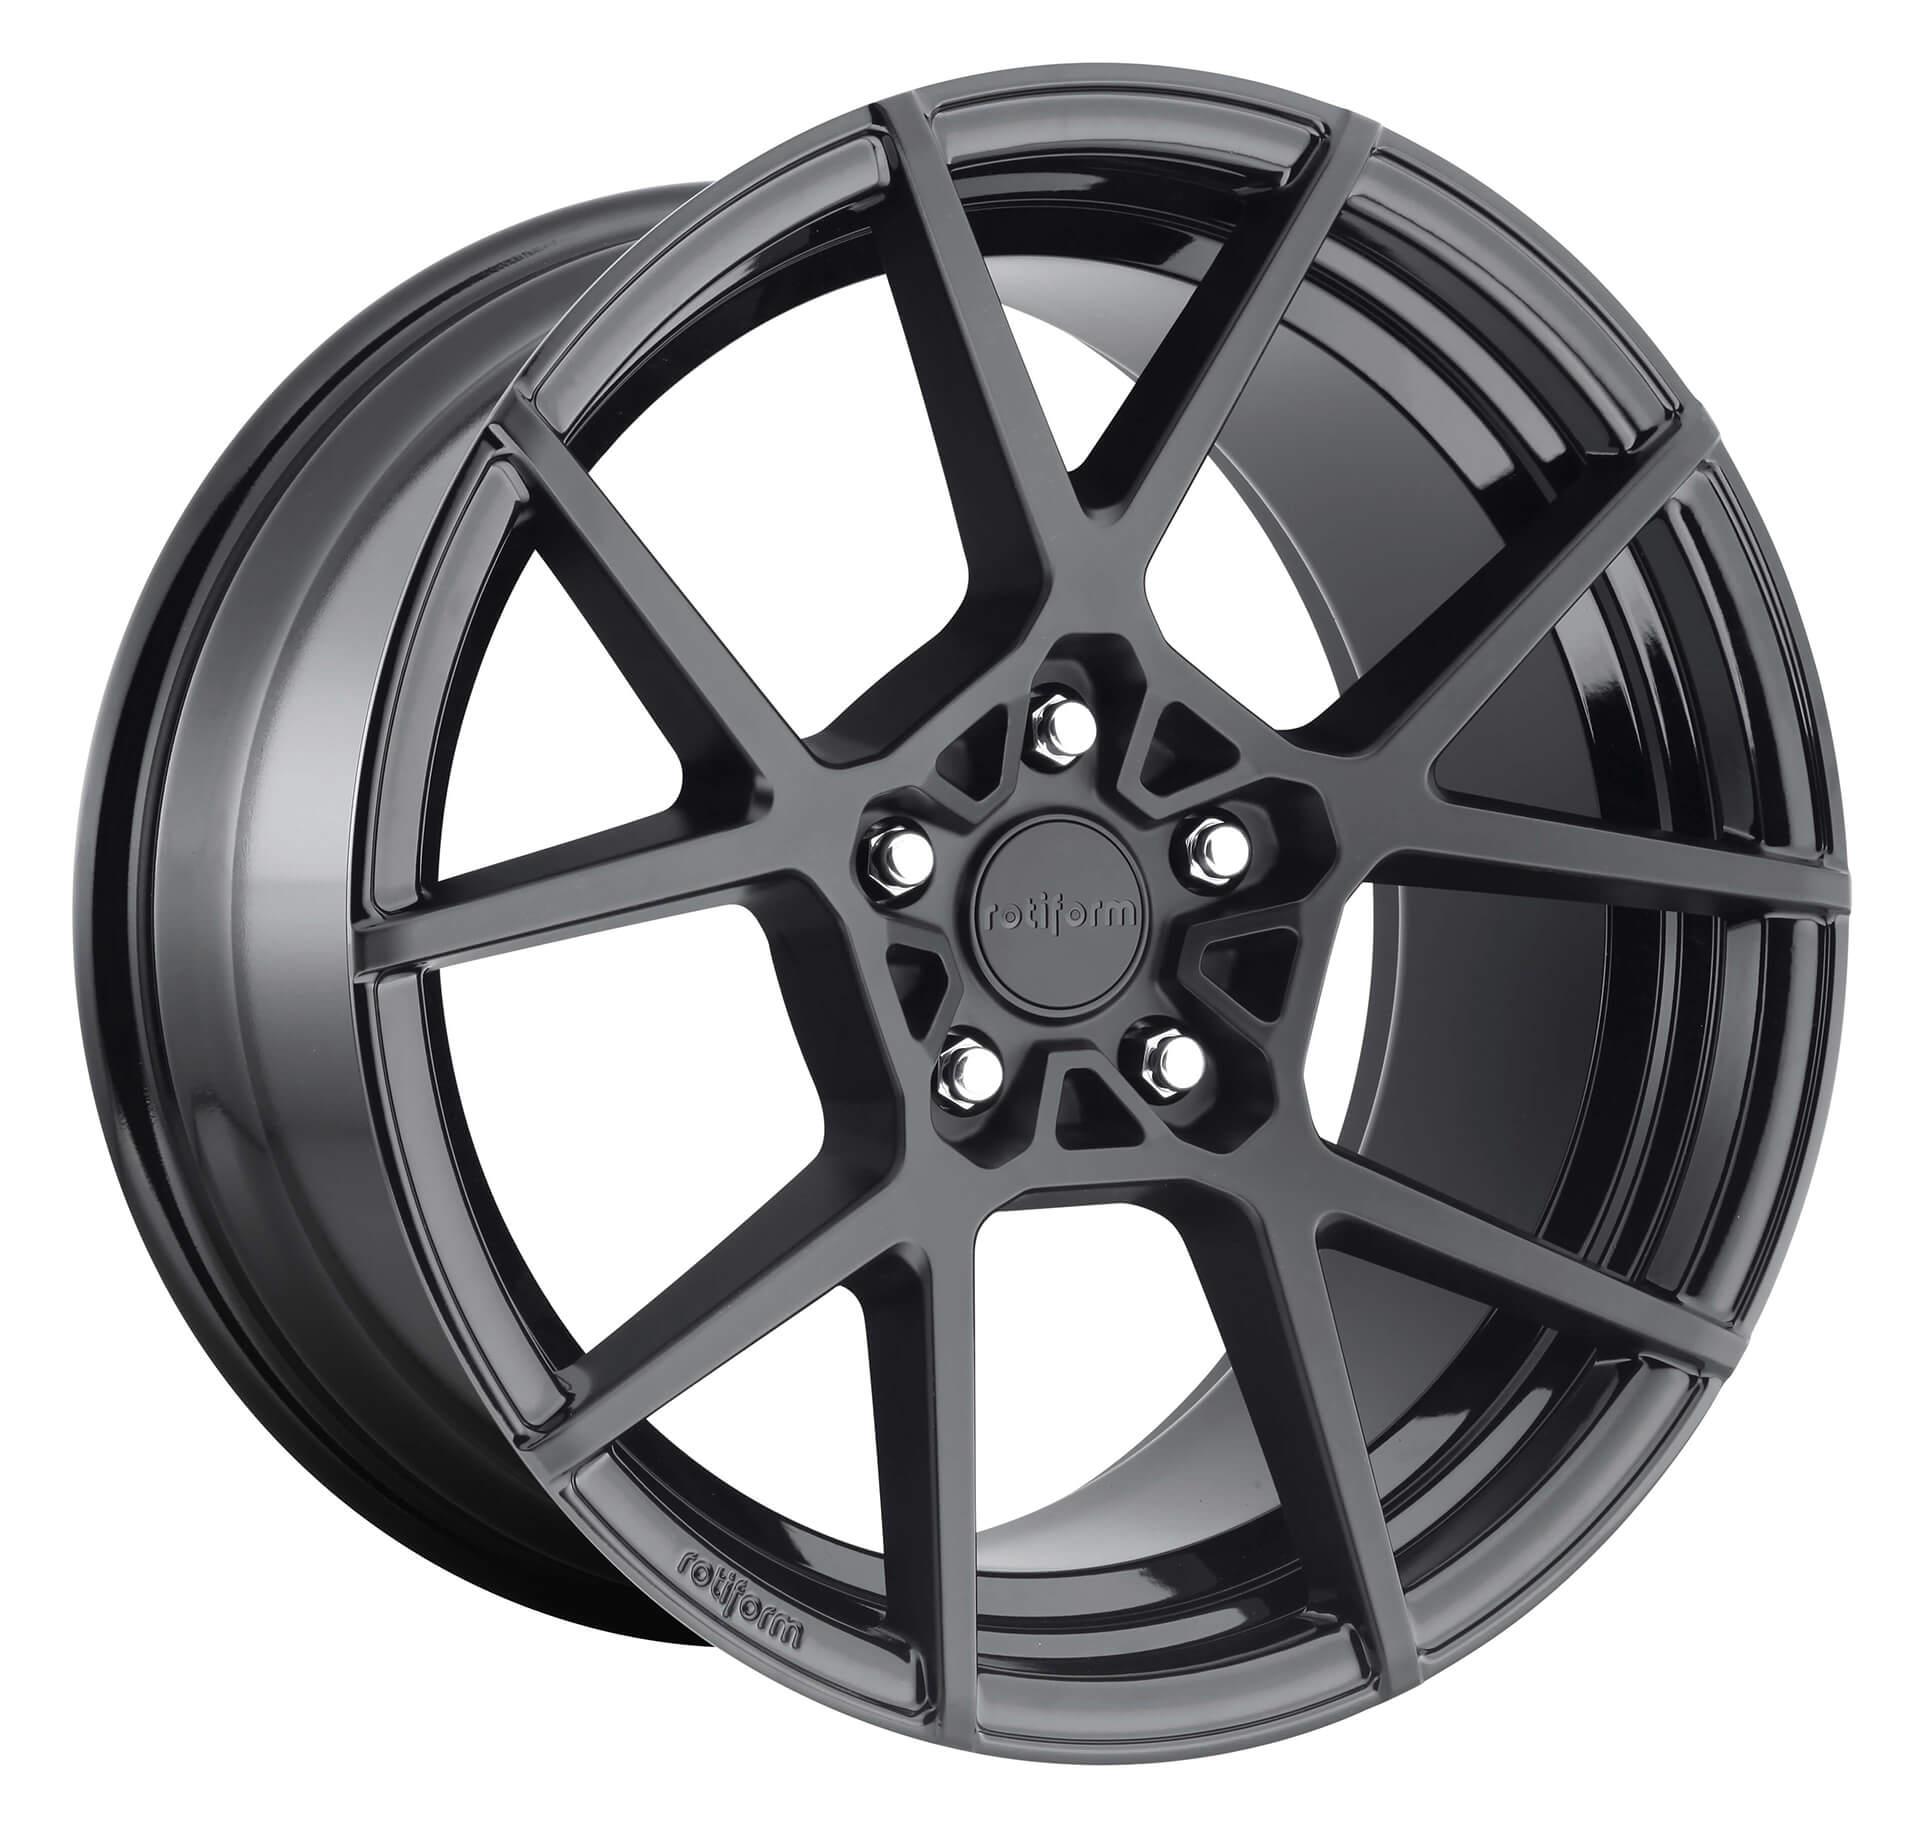 Rotiform Monoblock Wheel - KPS Cast 1 Piece